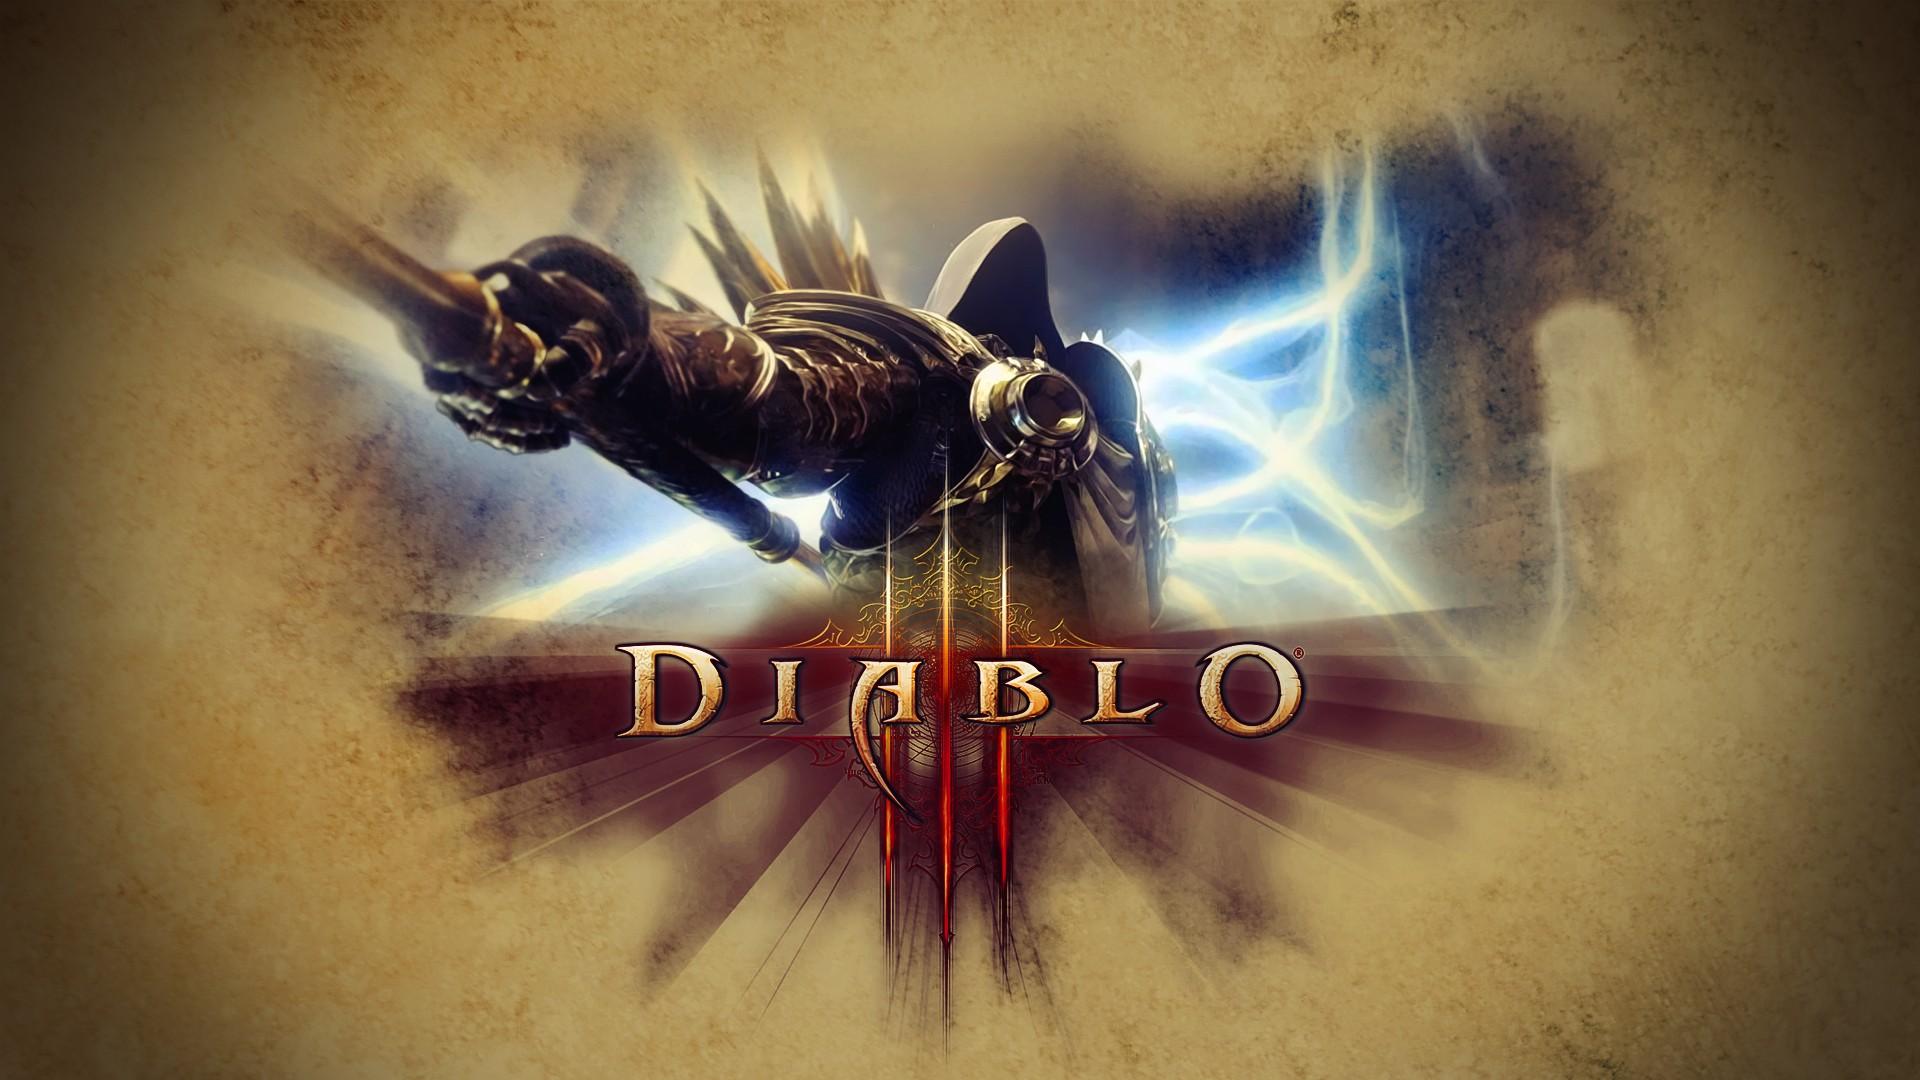 More Games Desktop Wallpapers Art Diablo 3 Wallpaper Tyrael 1291707 Hd Wallpaper Backgrounds Download